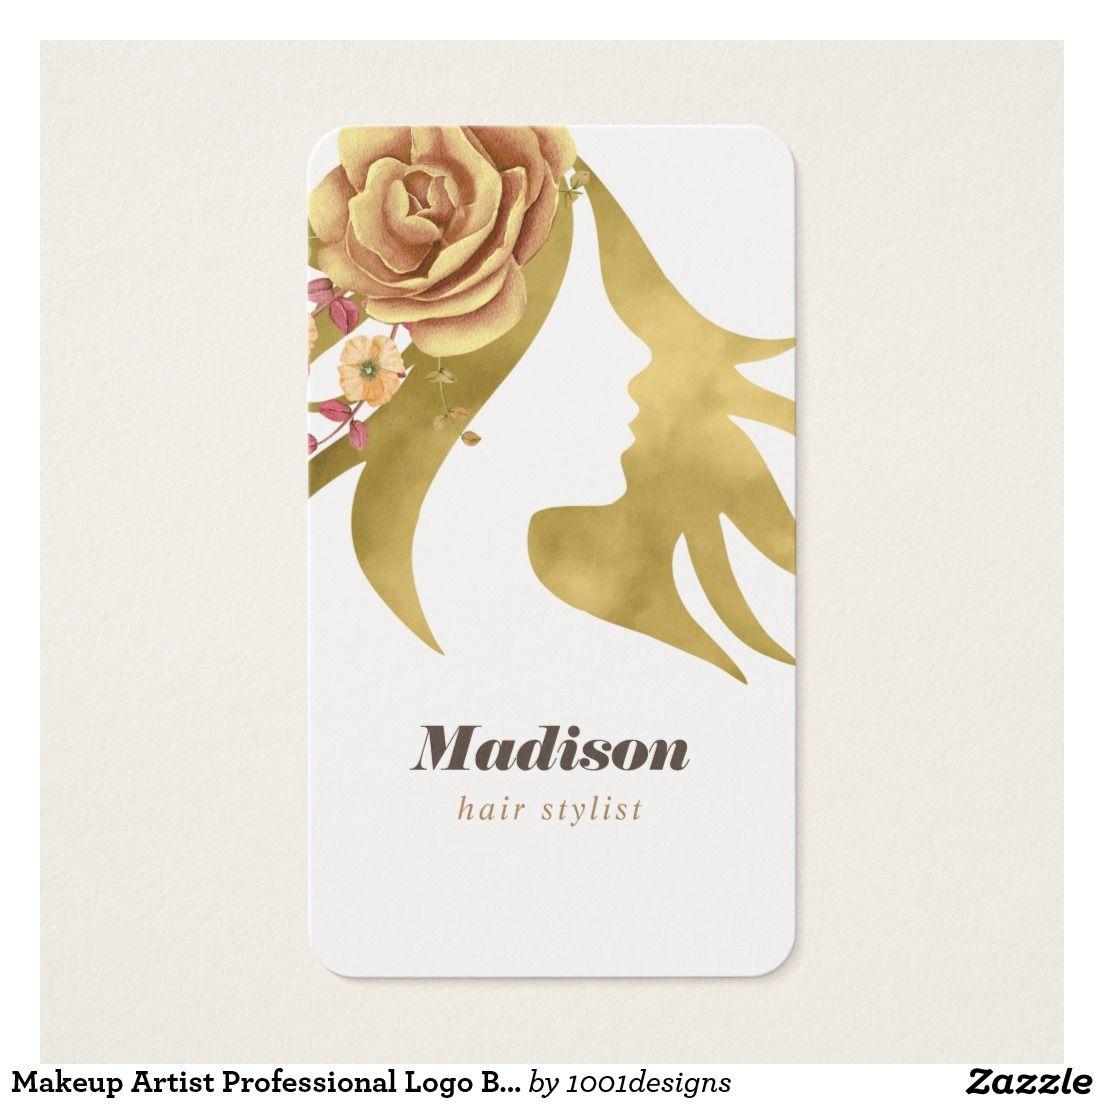 Makeup artist professional logo beauty salon lux business card makeup artist professional logo beauty salon lux business card colourmoves